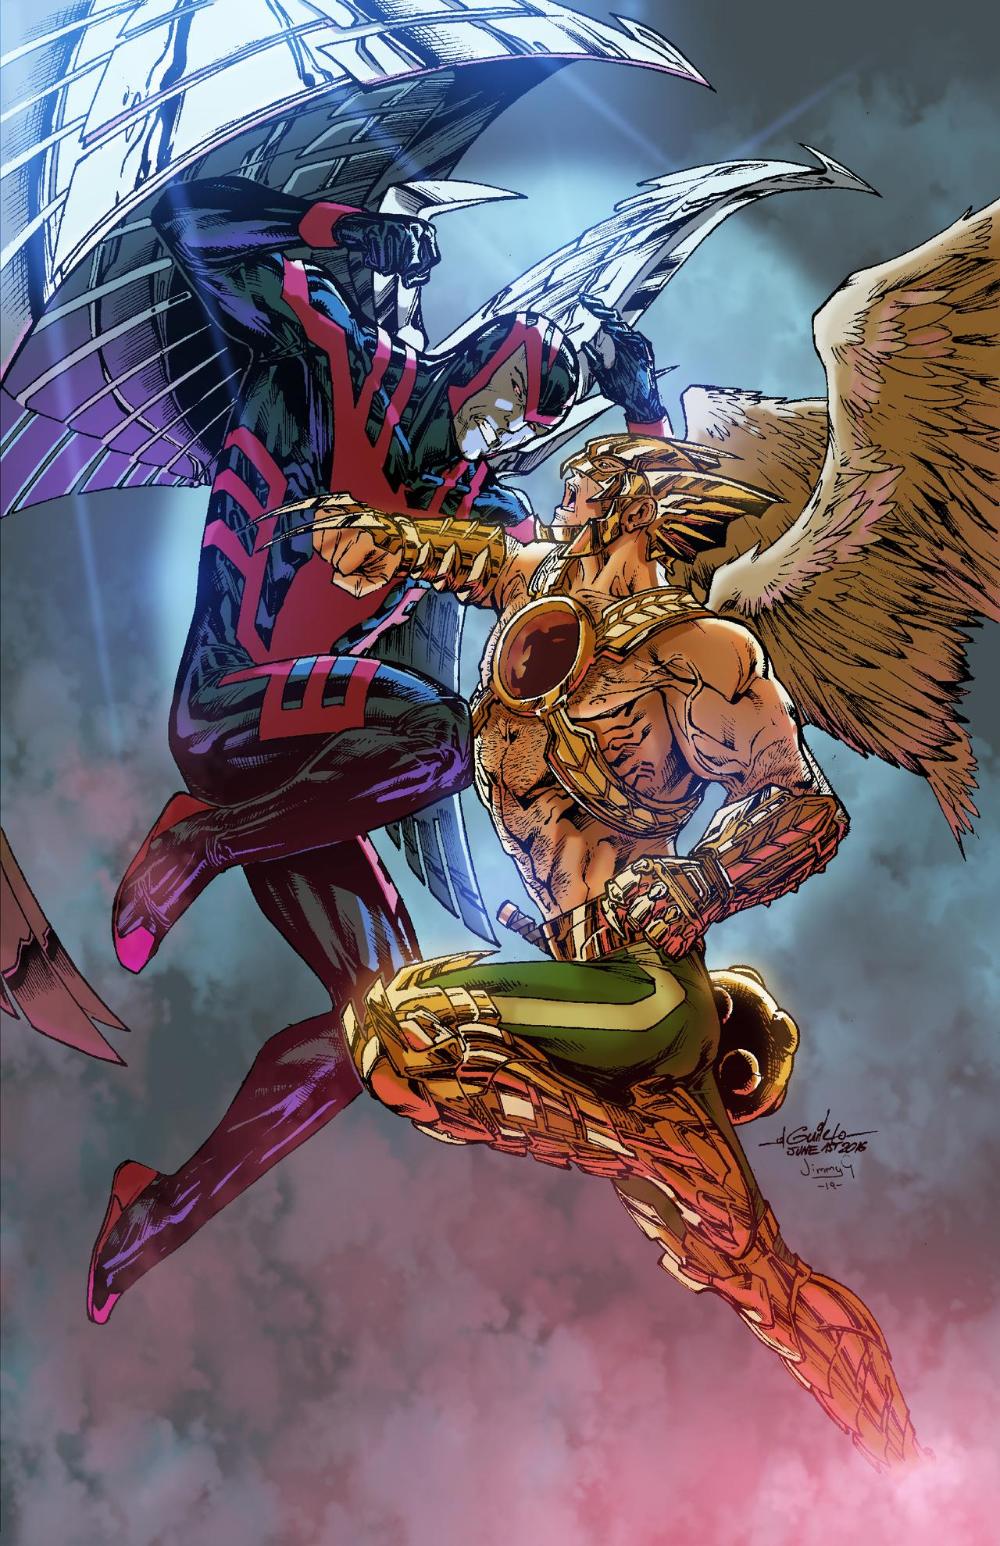 Archangel Vs Hawkman By Greenjaygraphic On Deviantart Marvel Comics Wallpaper Hawkman Dc Comics Heroes